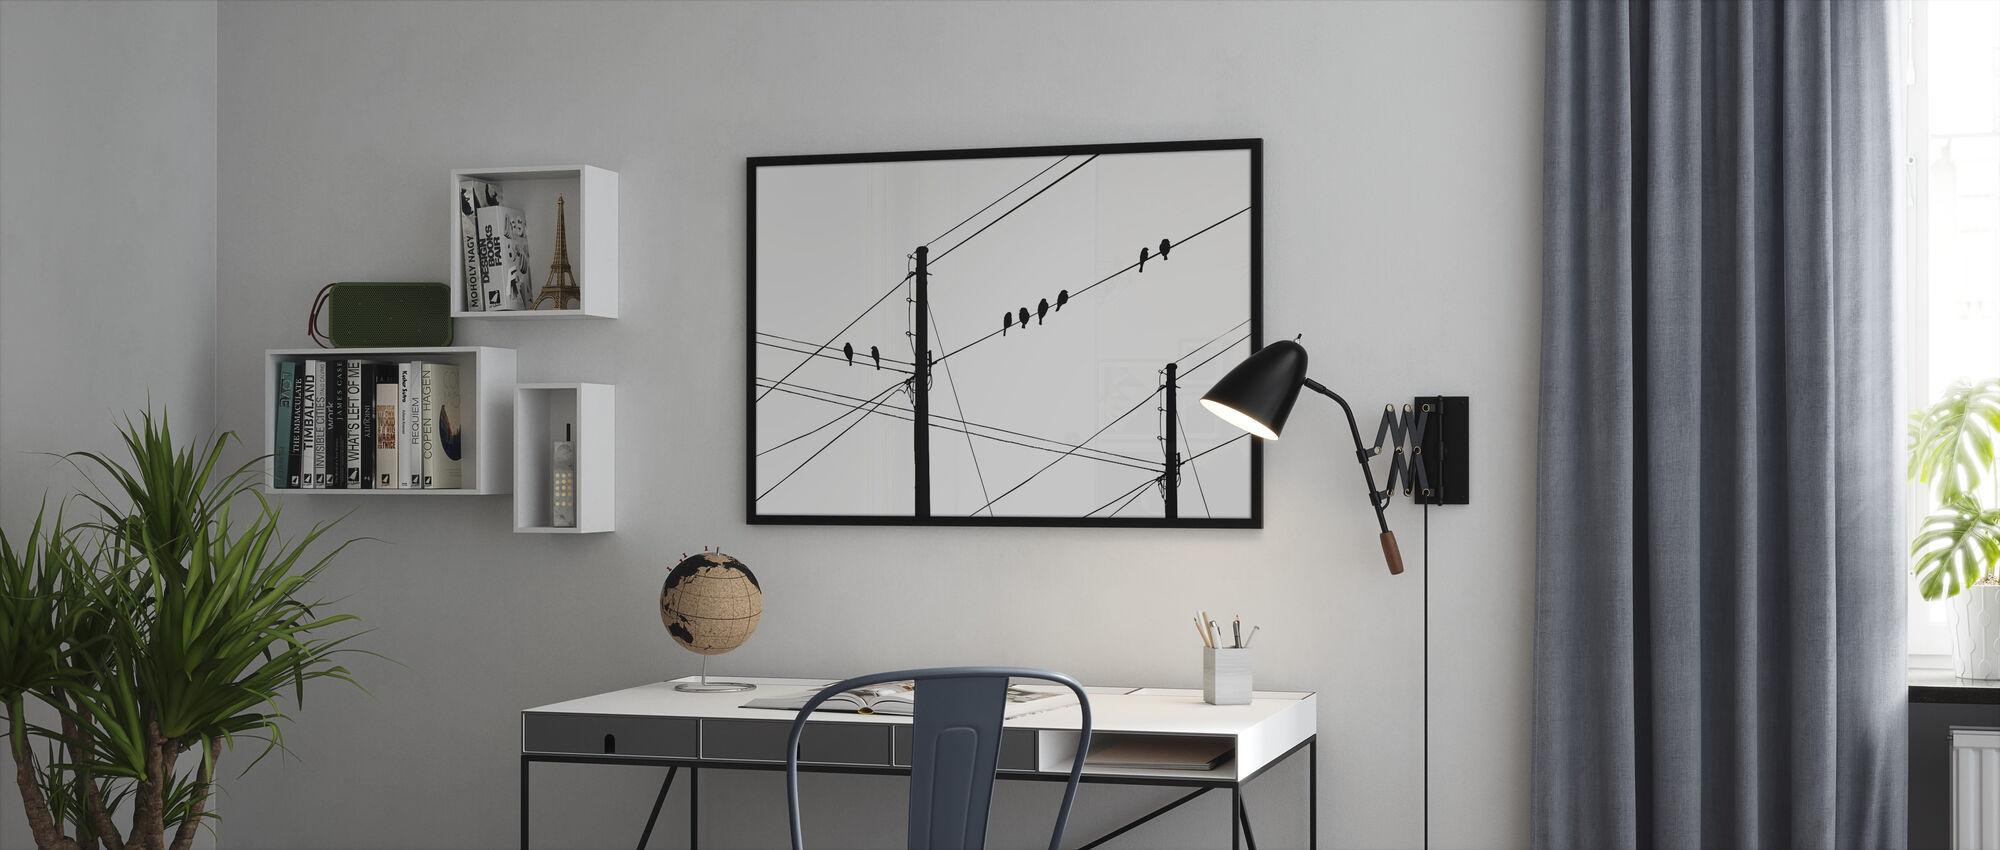 Powerlines - Black - Framed print - Office